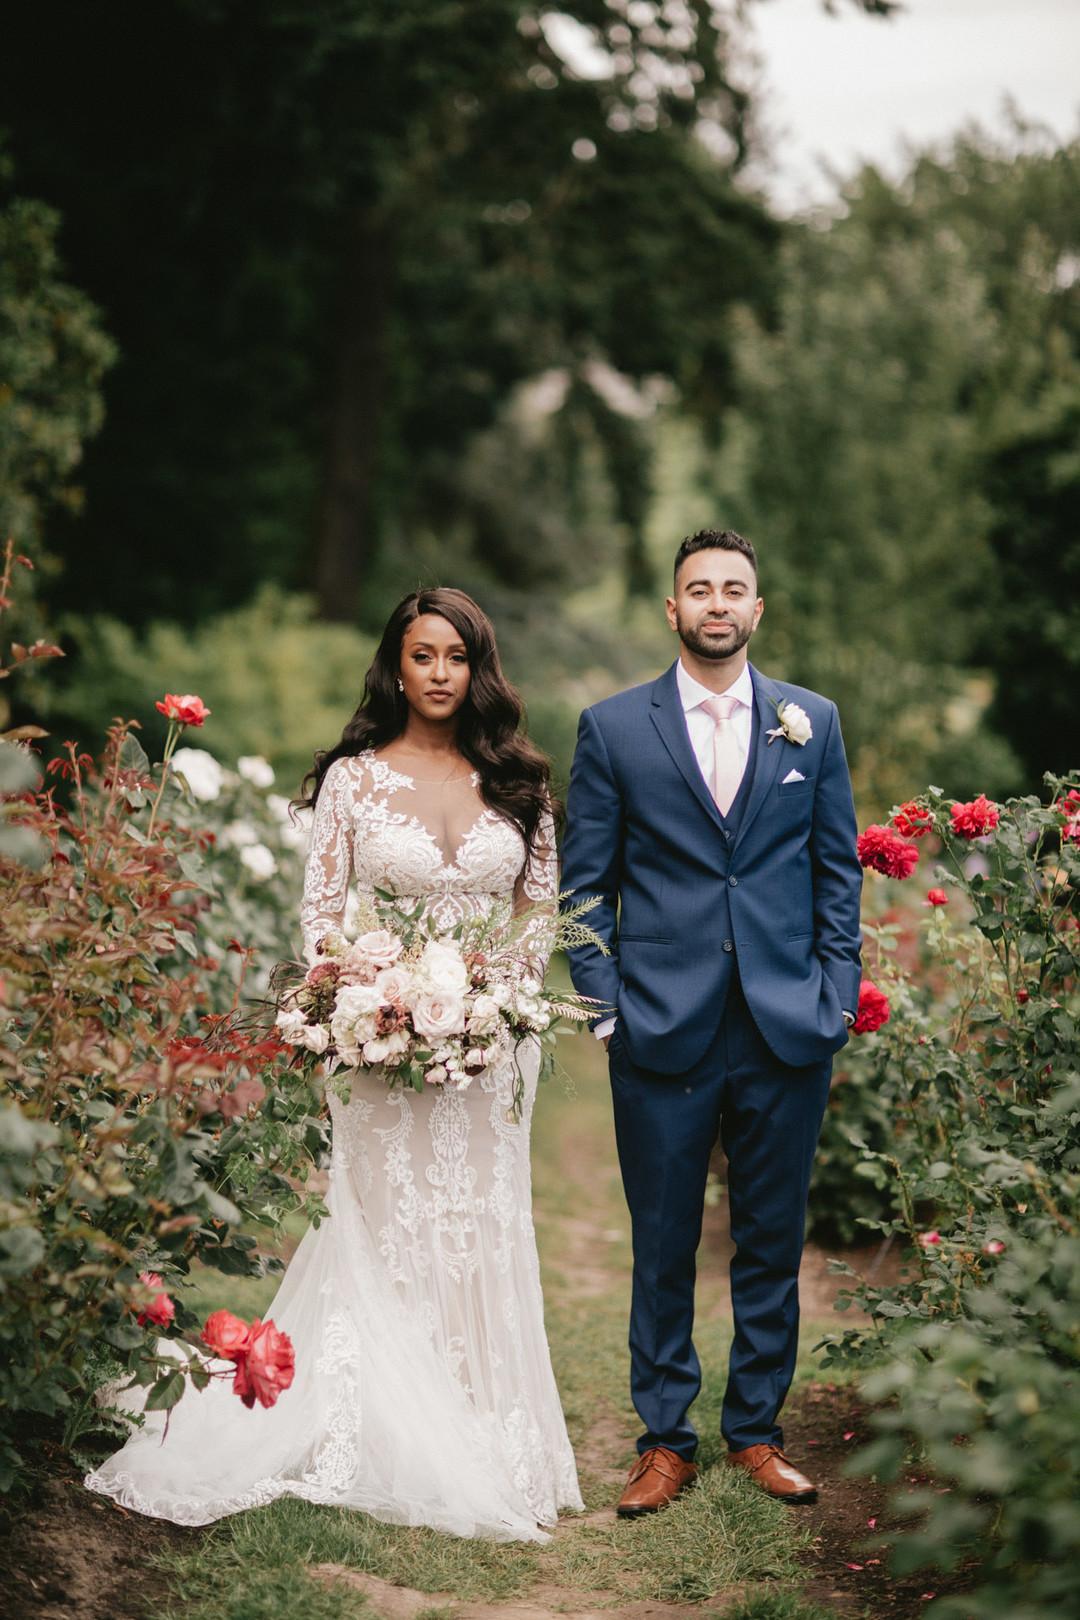 black bride and groom in rose garden